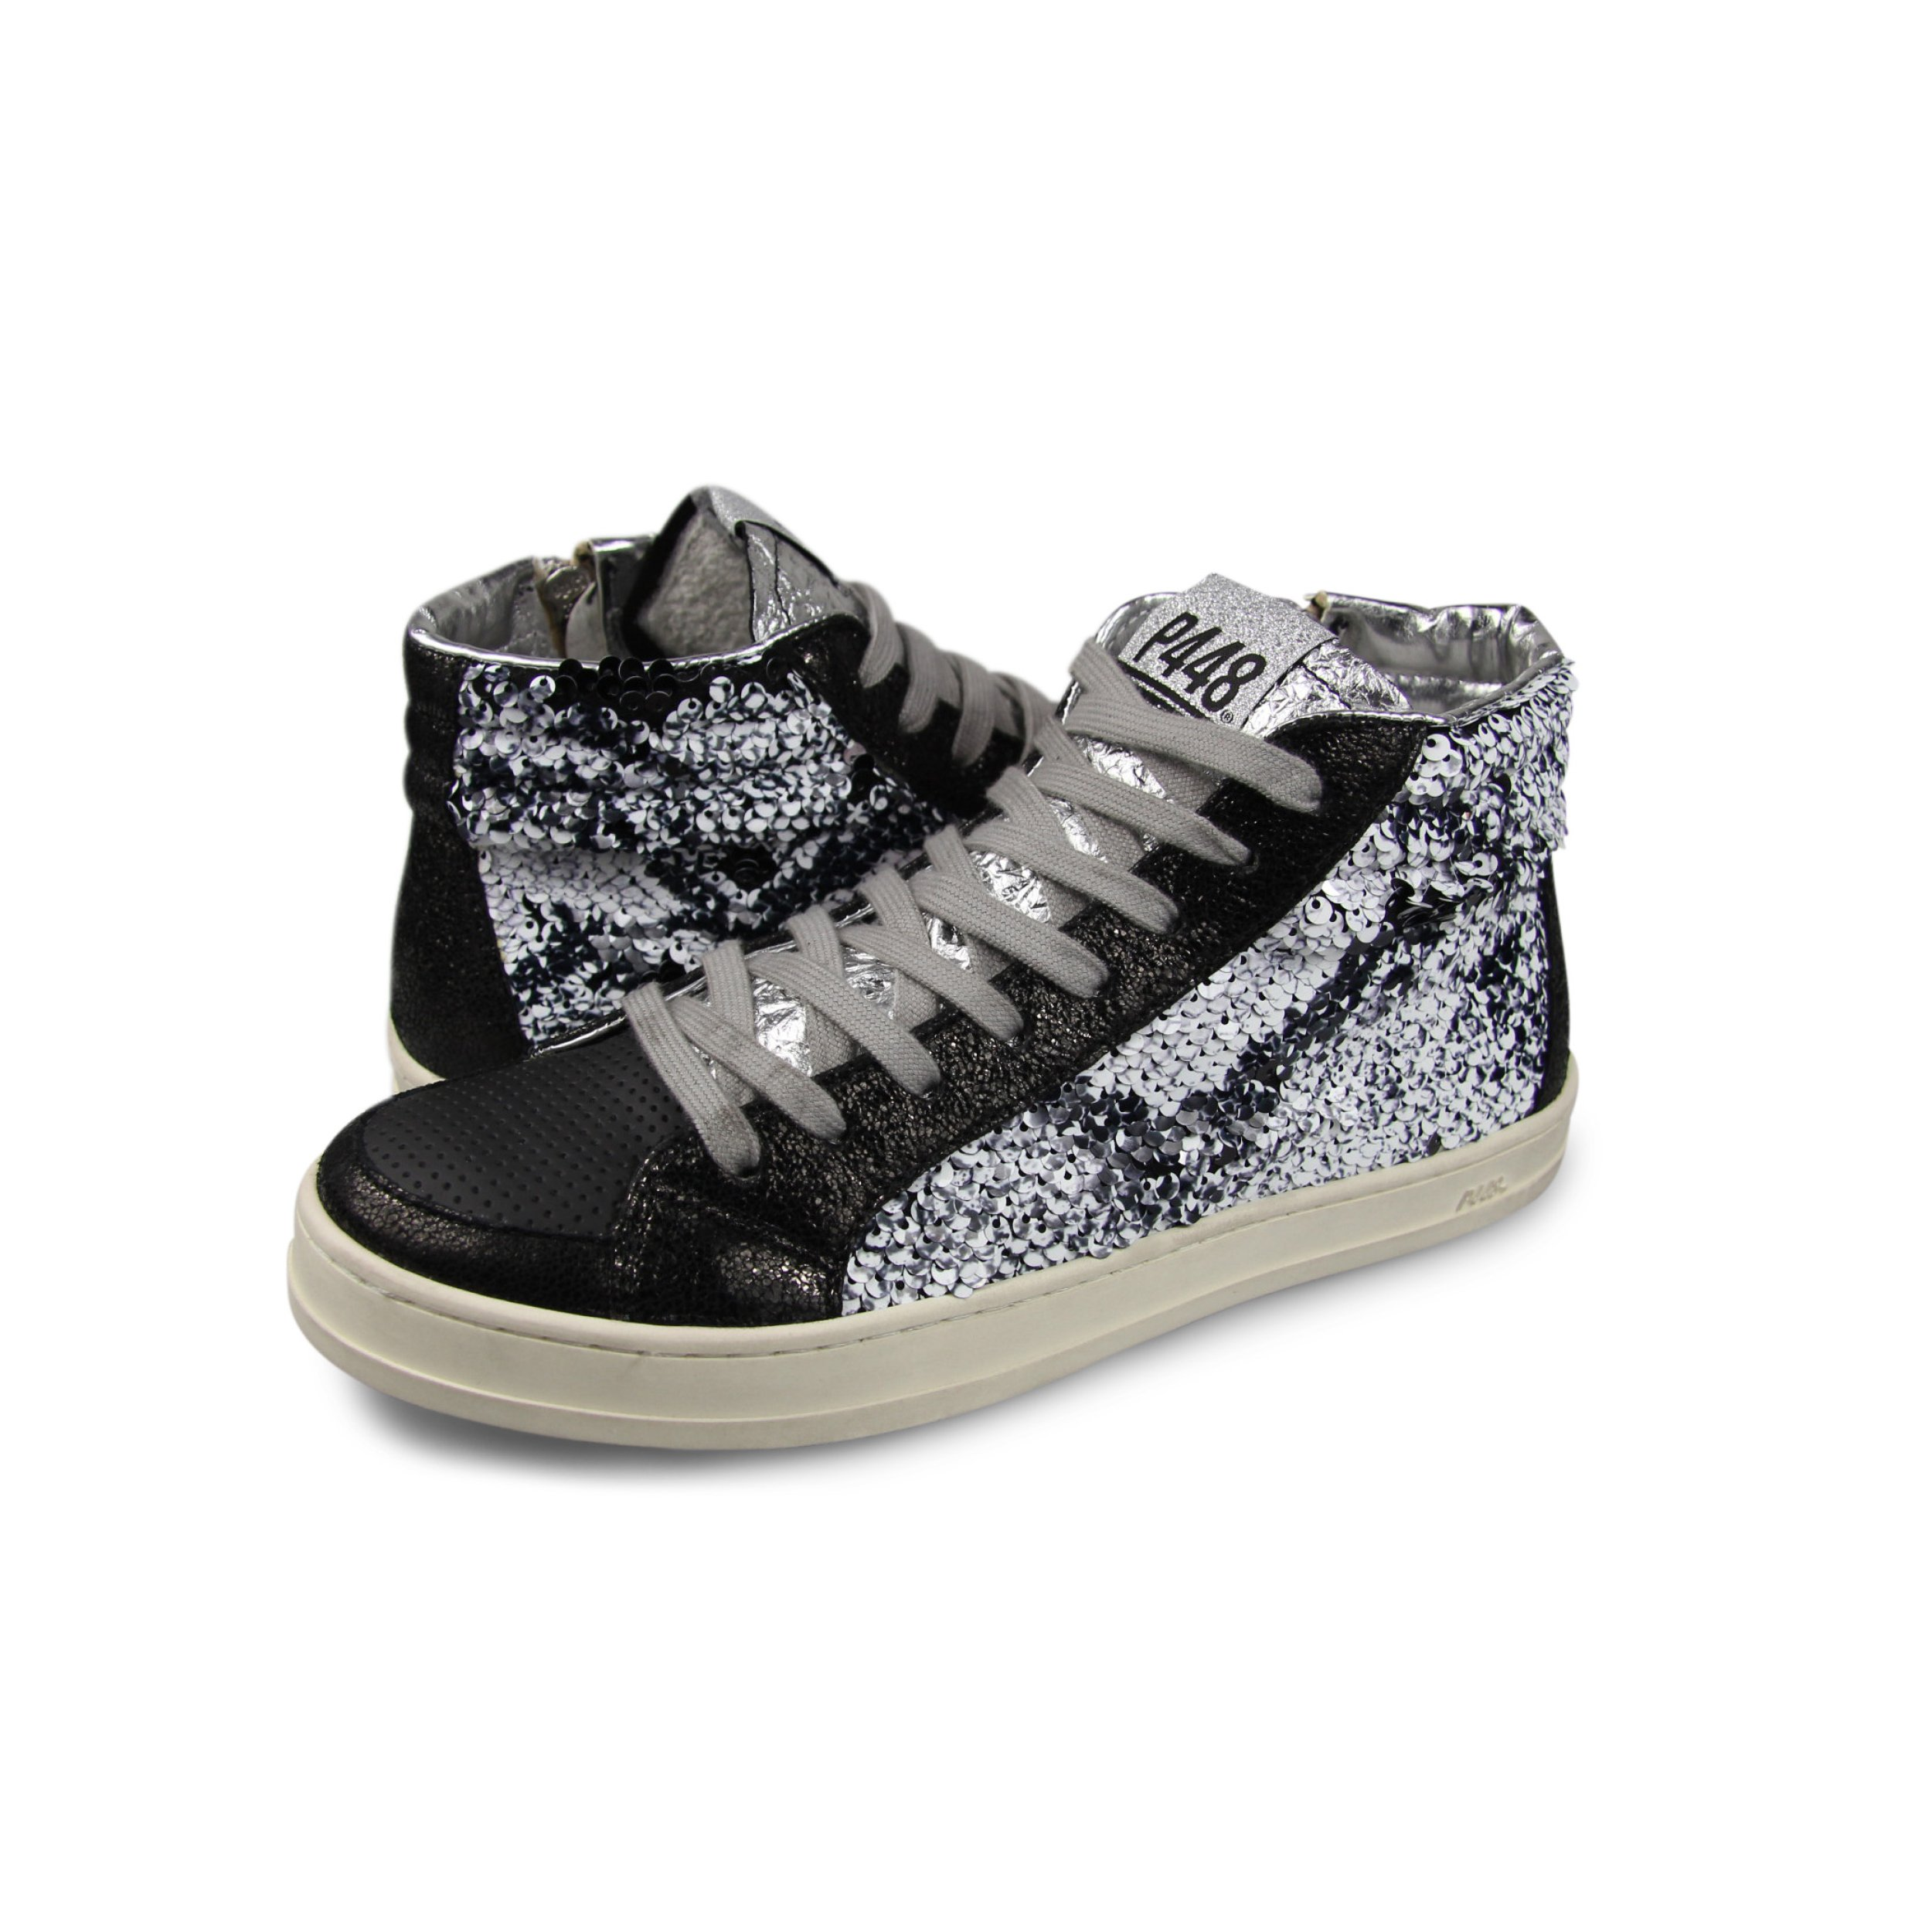 P448 Women's Skate Italian Leather Paillettes Sneaker EU 37 - US 6/6.5